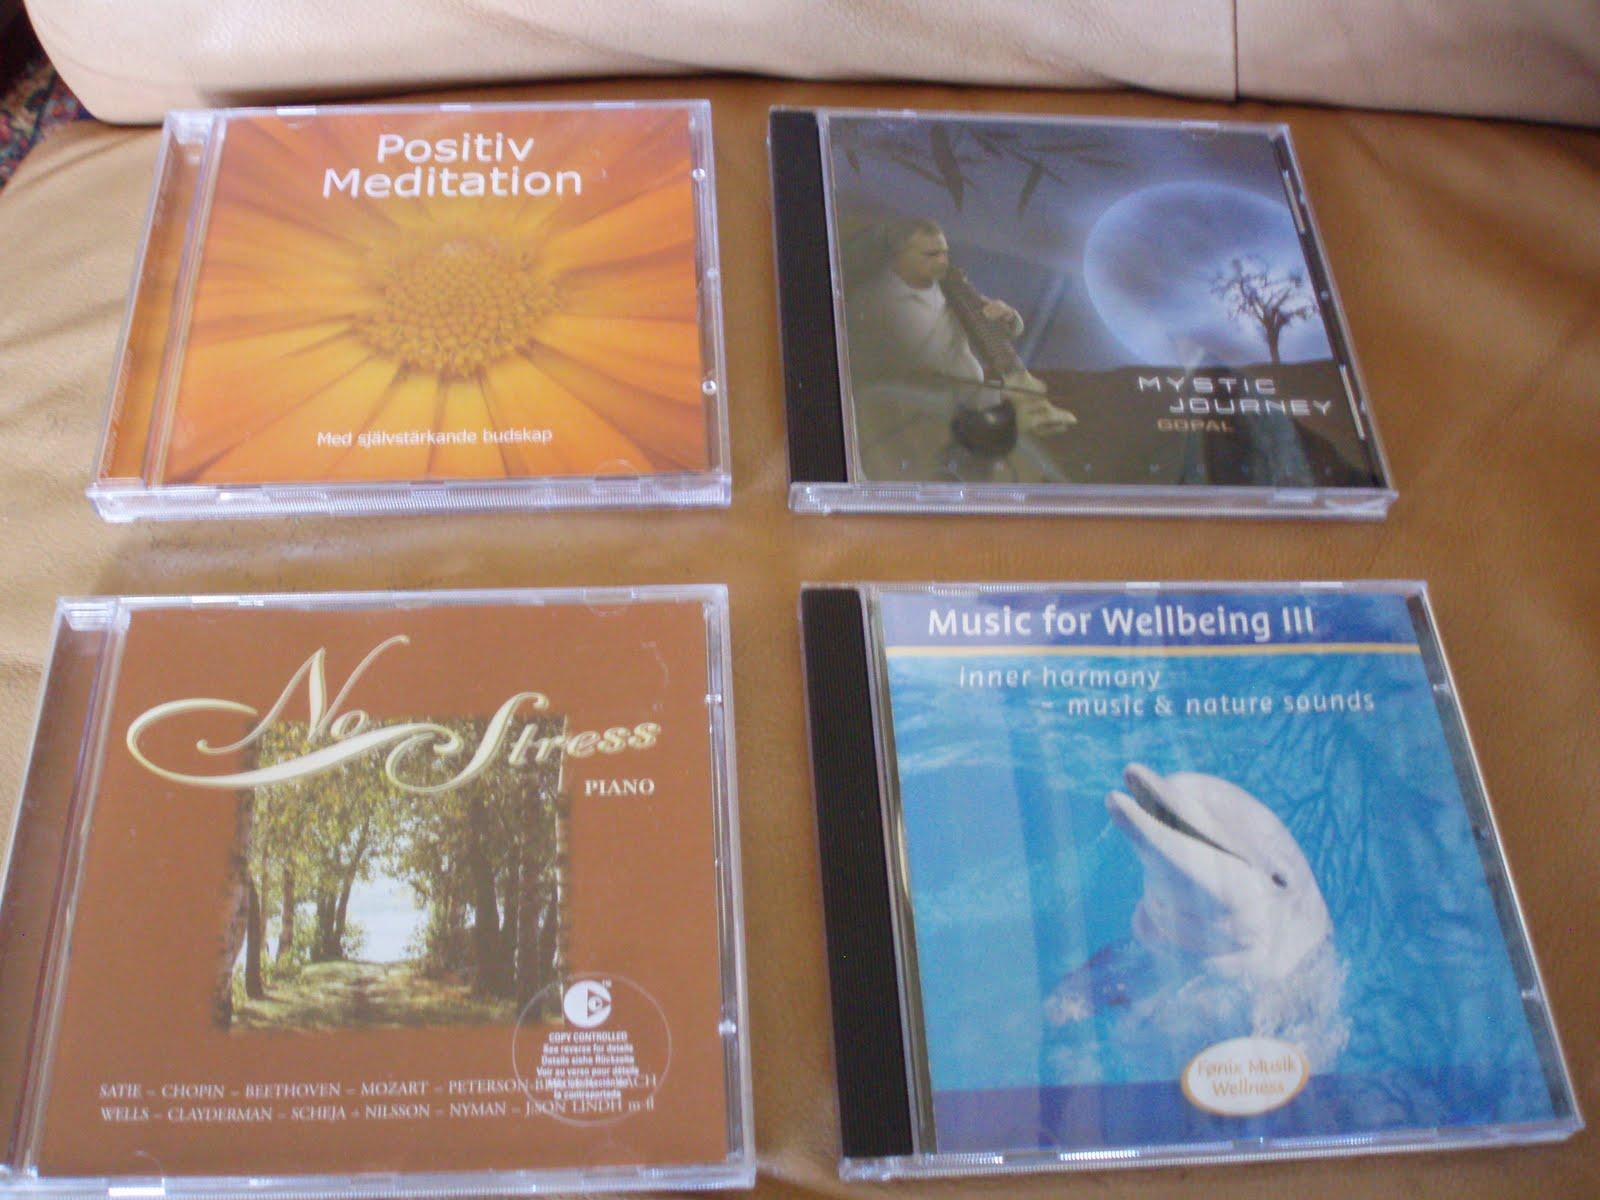 Meditativ musik som biter i skinnet